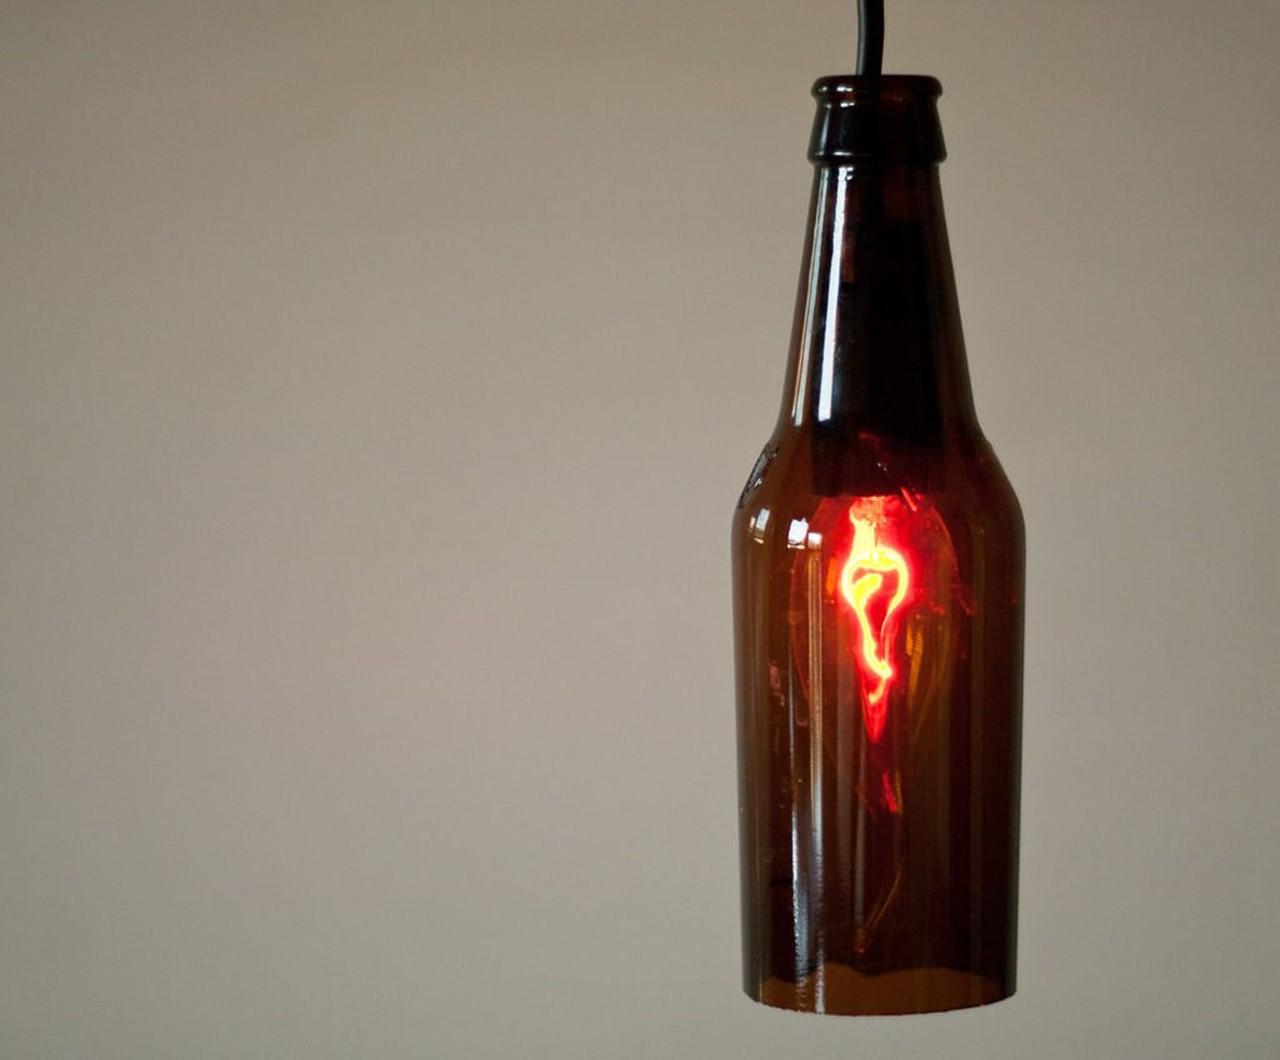 Beer bottle fun